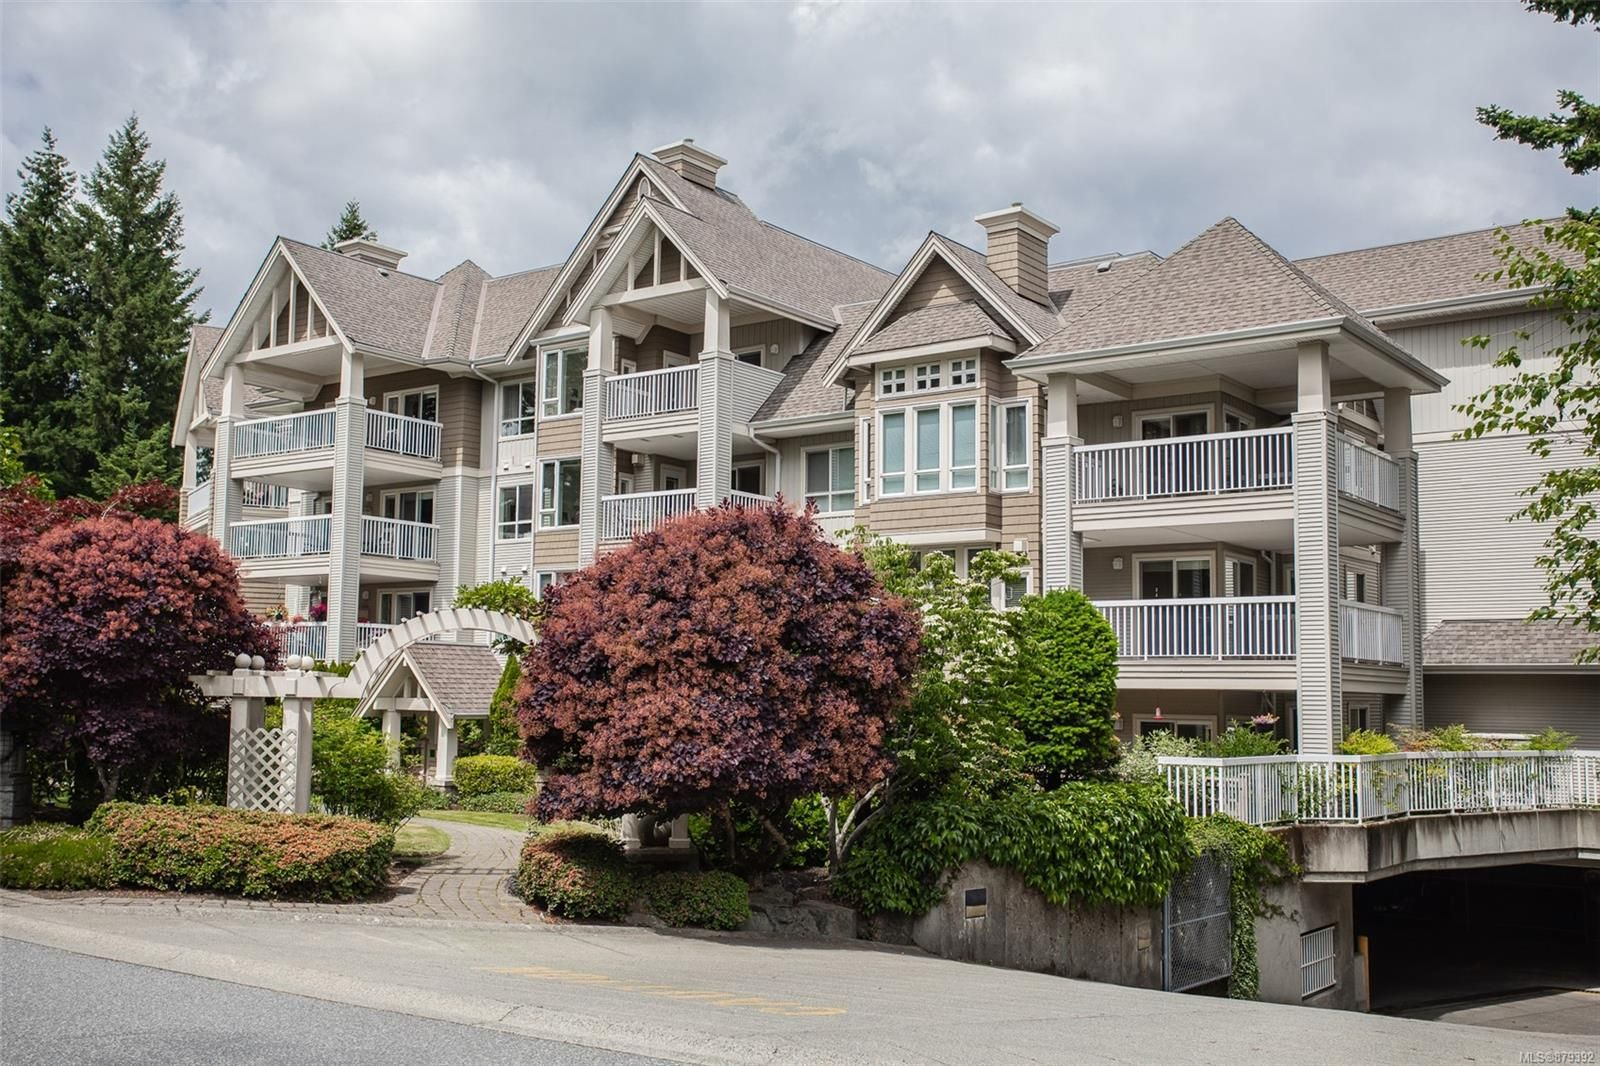 Main Photo: 205 5685 Edgewater Lane in : Na North Nanaimo Condo for sale (Nanaimo)  : MLS®# 879392